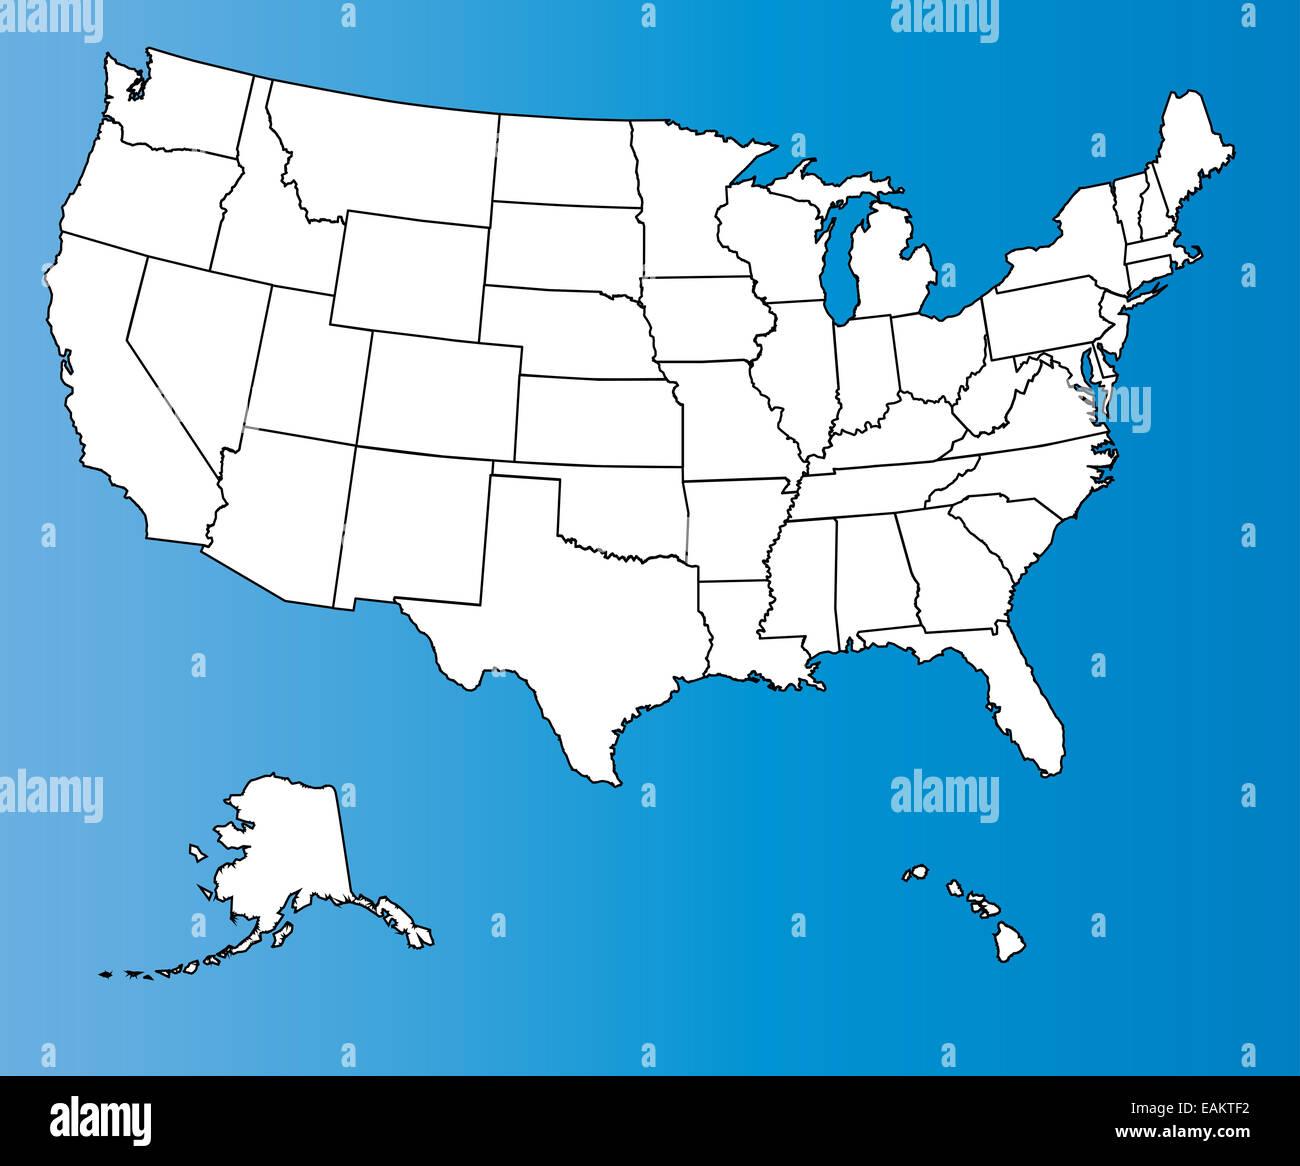 Usa Blank Map State Borders Stock Photos & Usa Blank Map ...